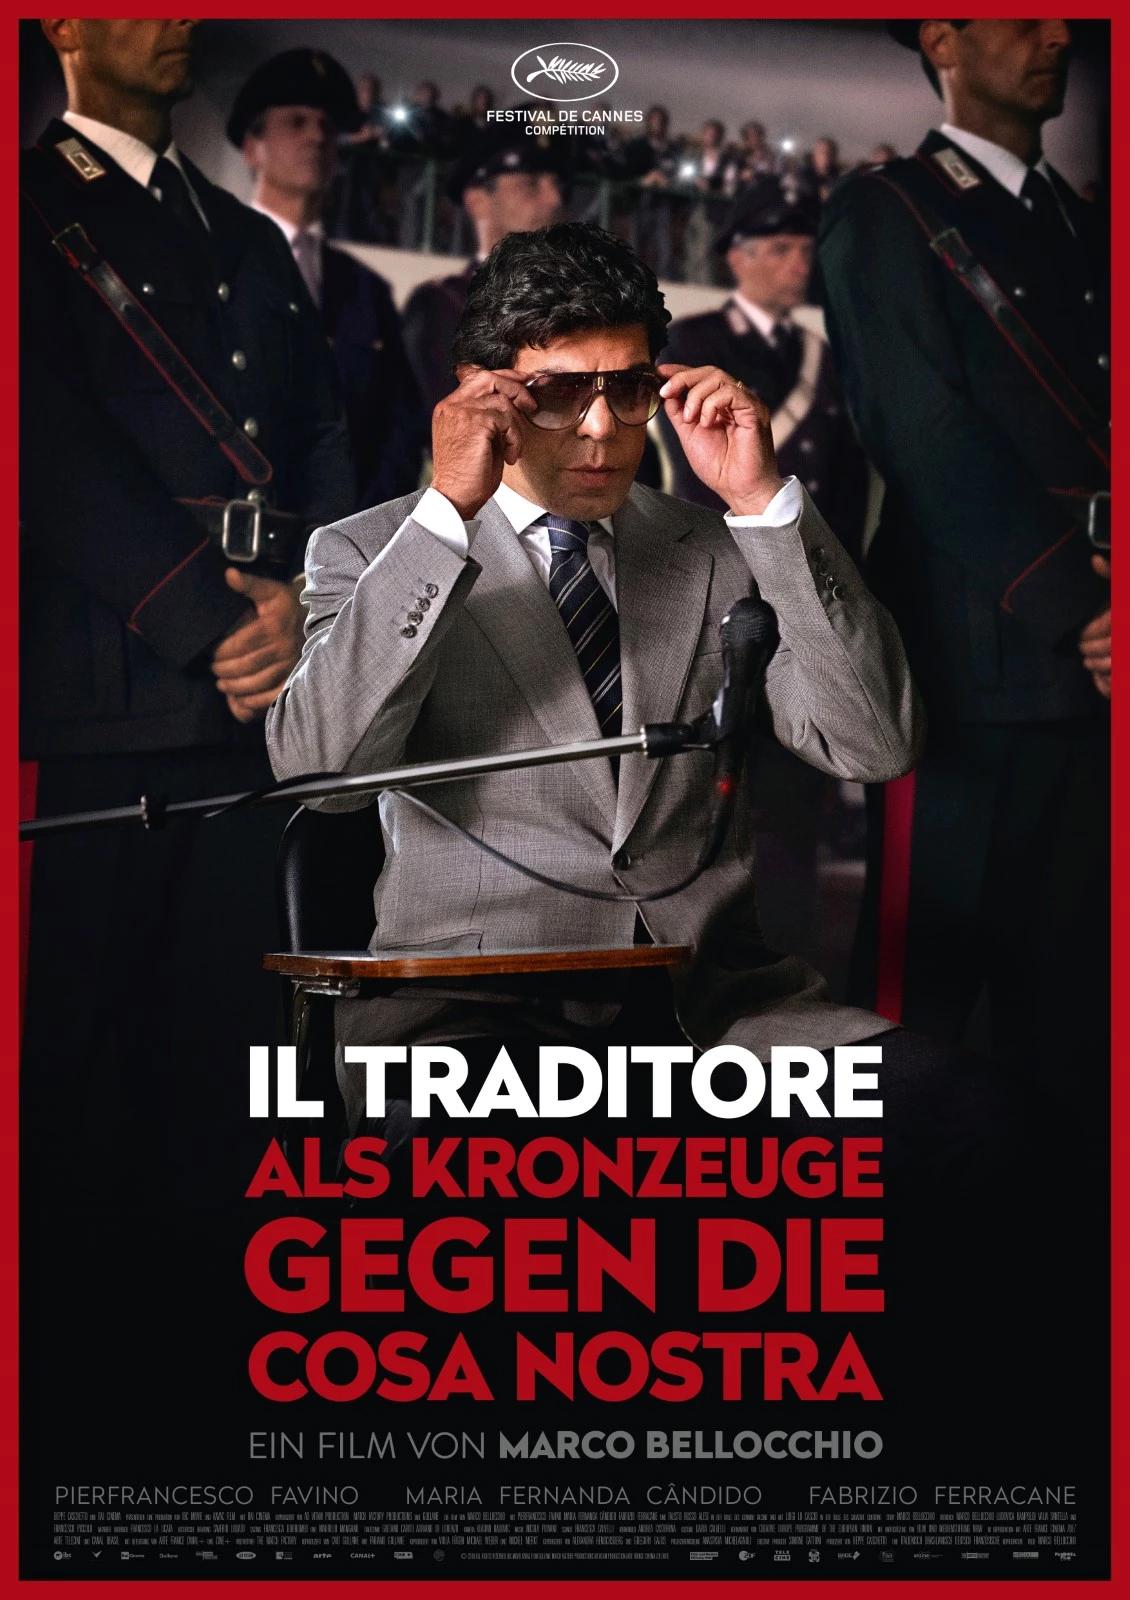 Il traditore film buscetta in brasile cover auf deutsch